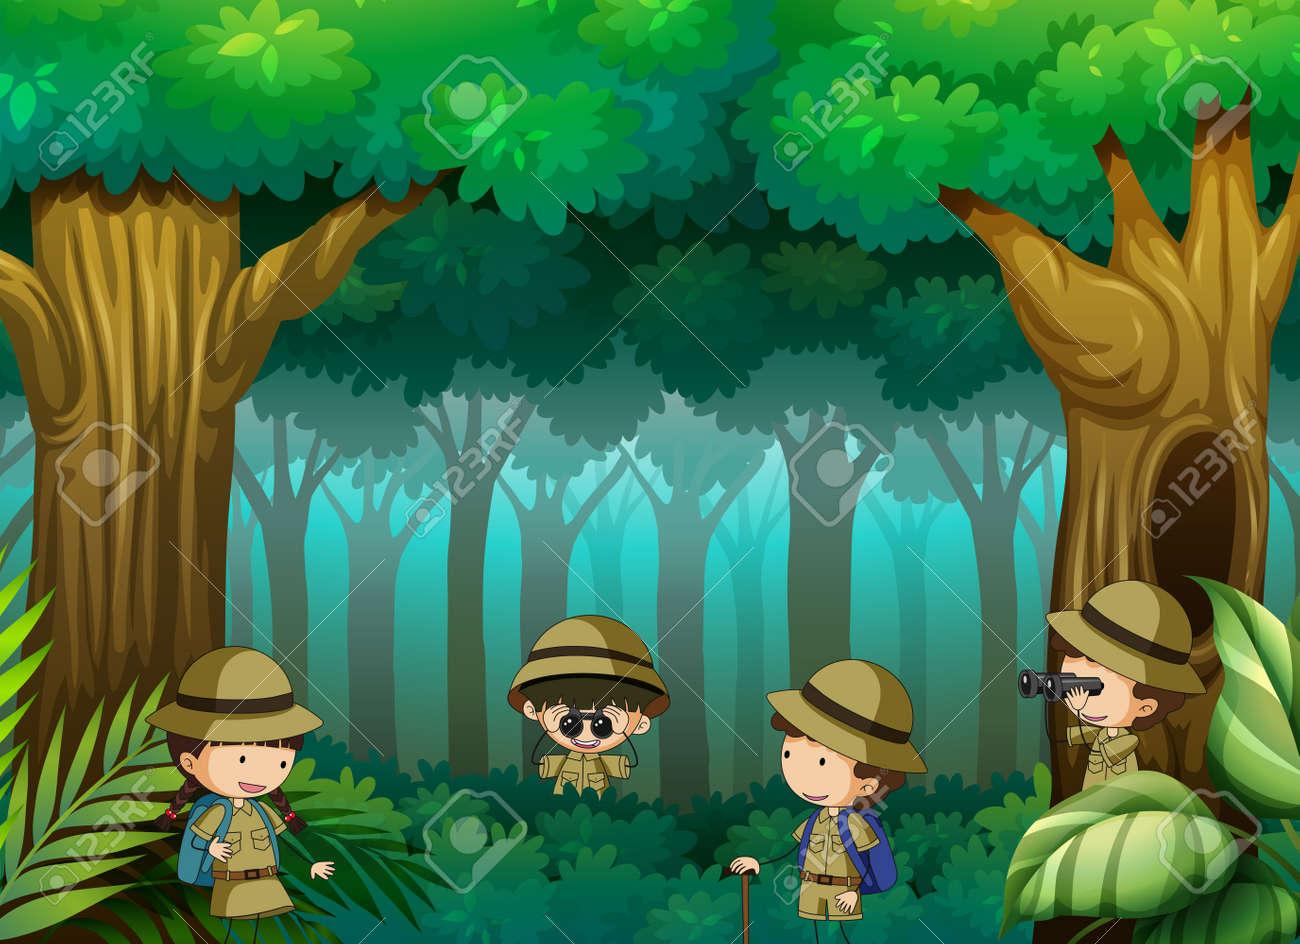 Children exploring the forest illustration - 121751473